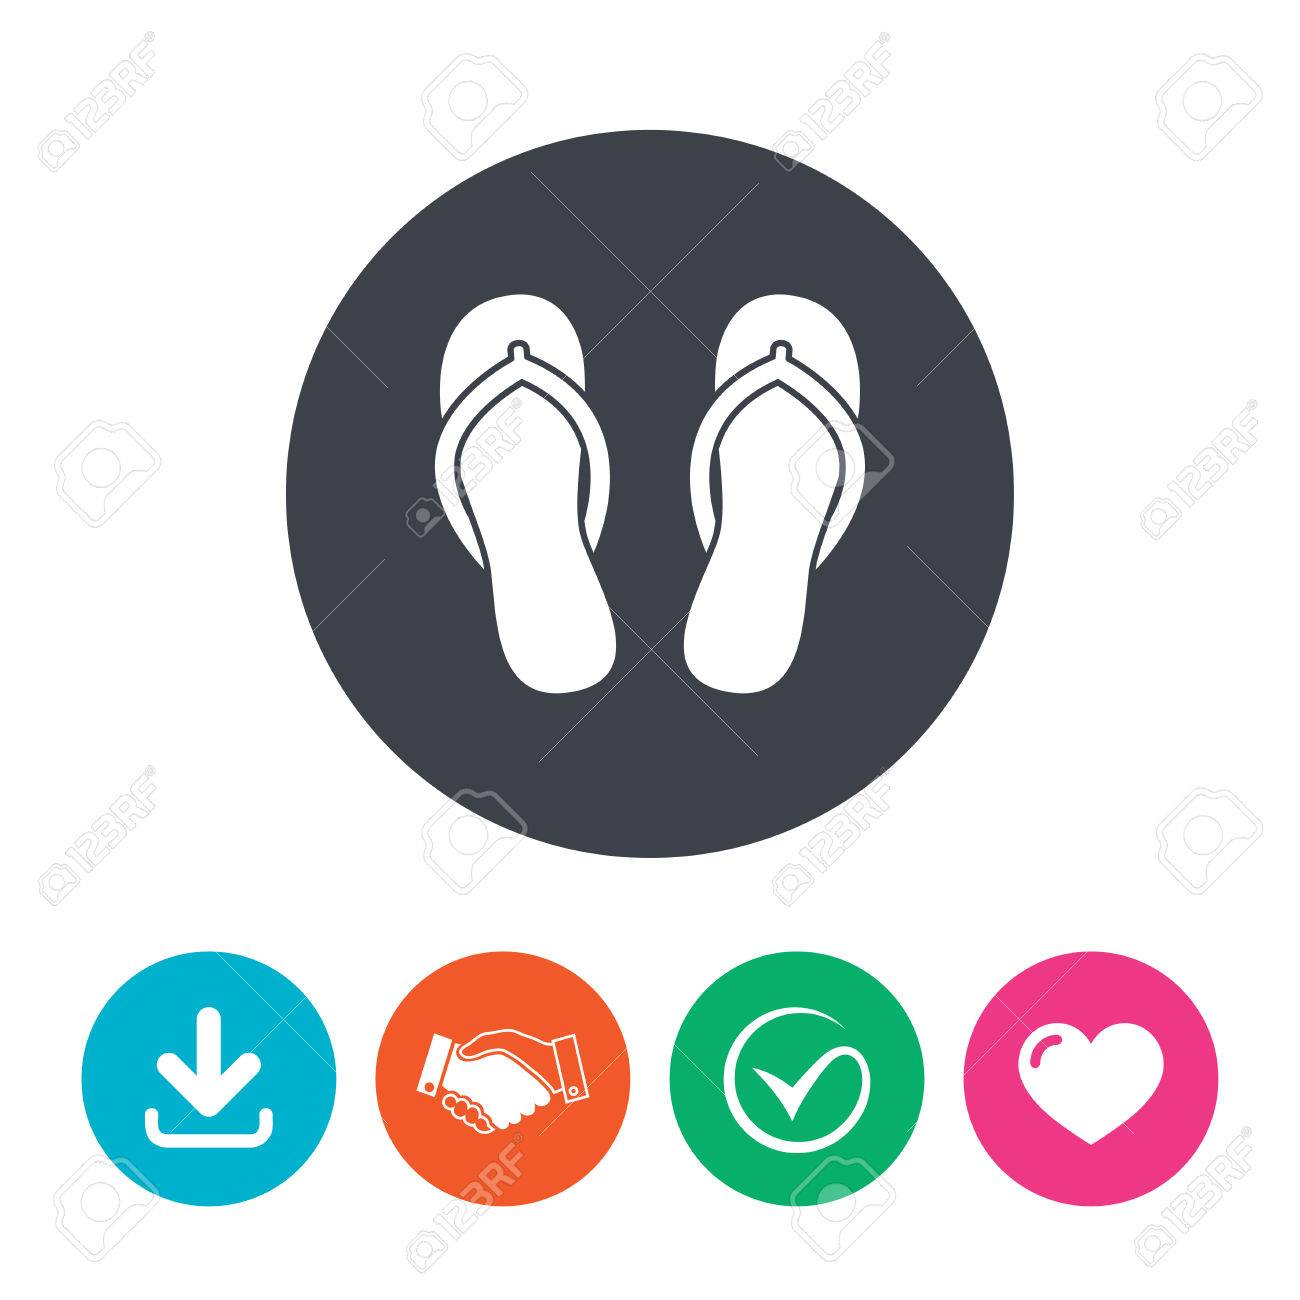 ee6436a4e198 Flip-flops Sign Icon. Beach Shoes. Sand Sandals. Download Arrow ...